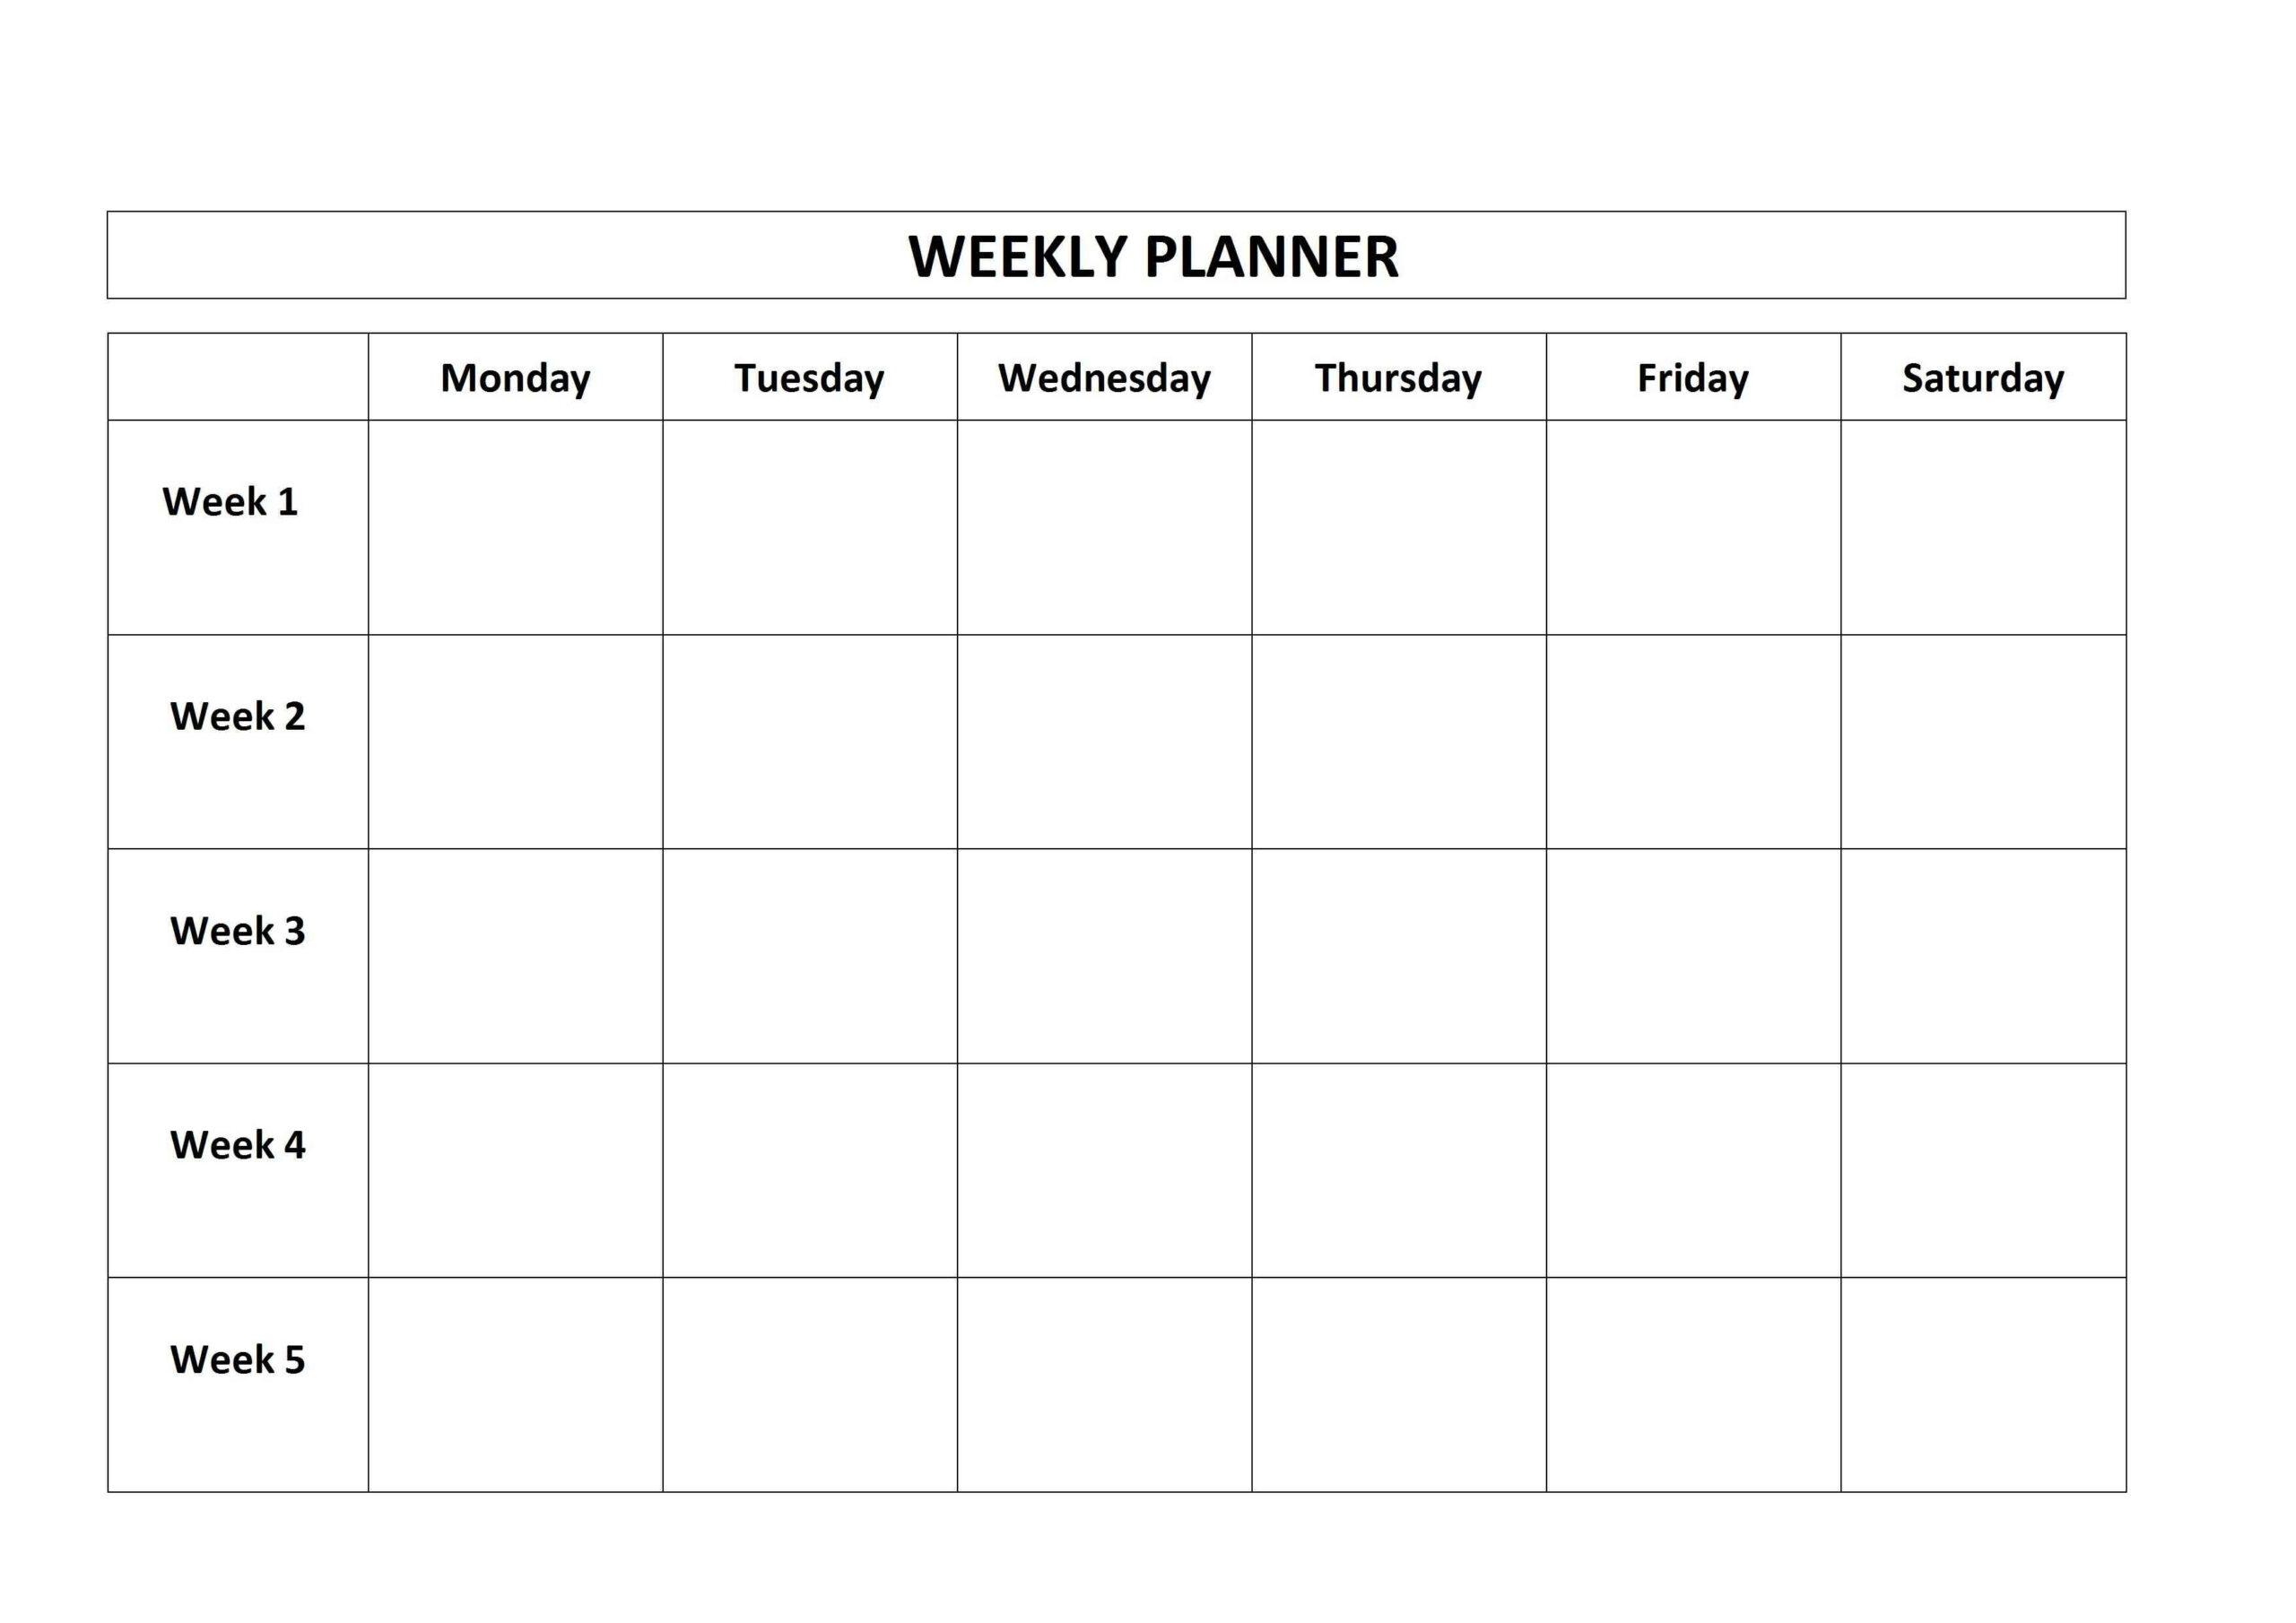 Blank Monday Through Friday Calendars | Example Calendar in Two Week Calender